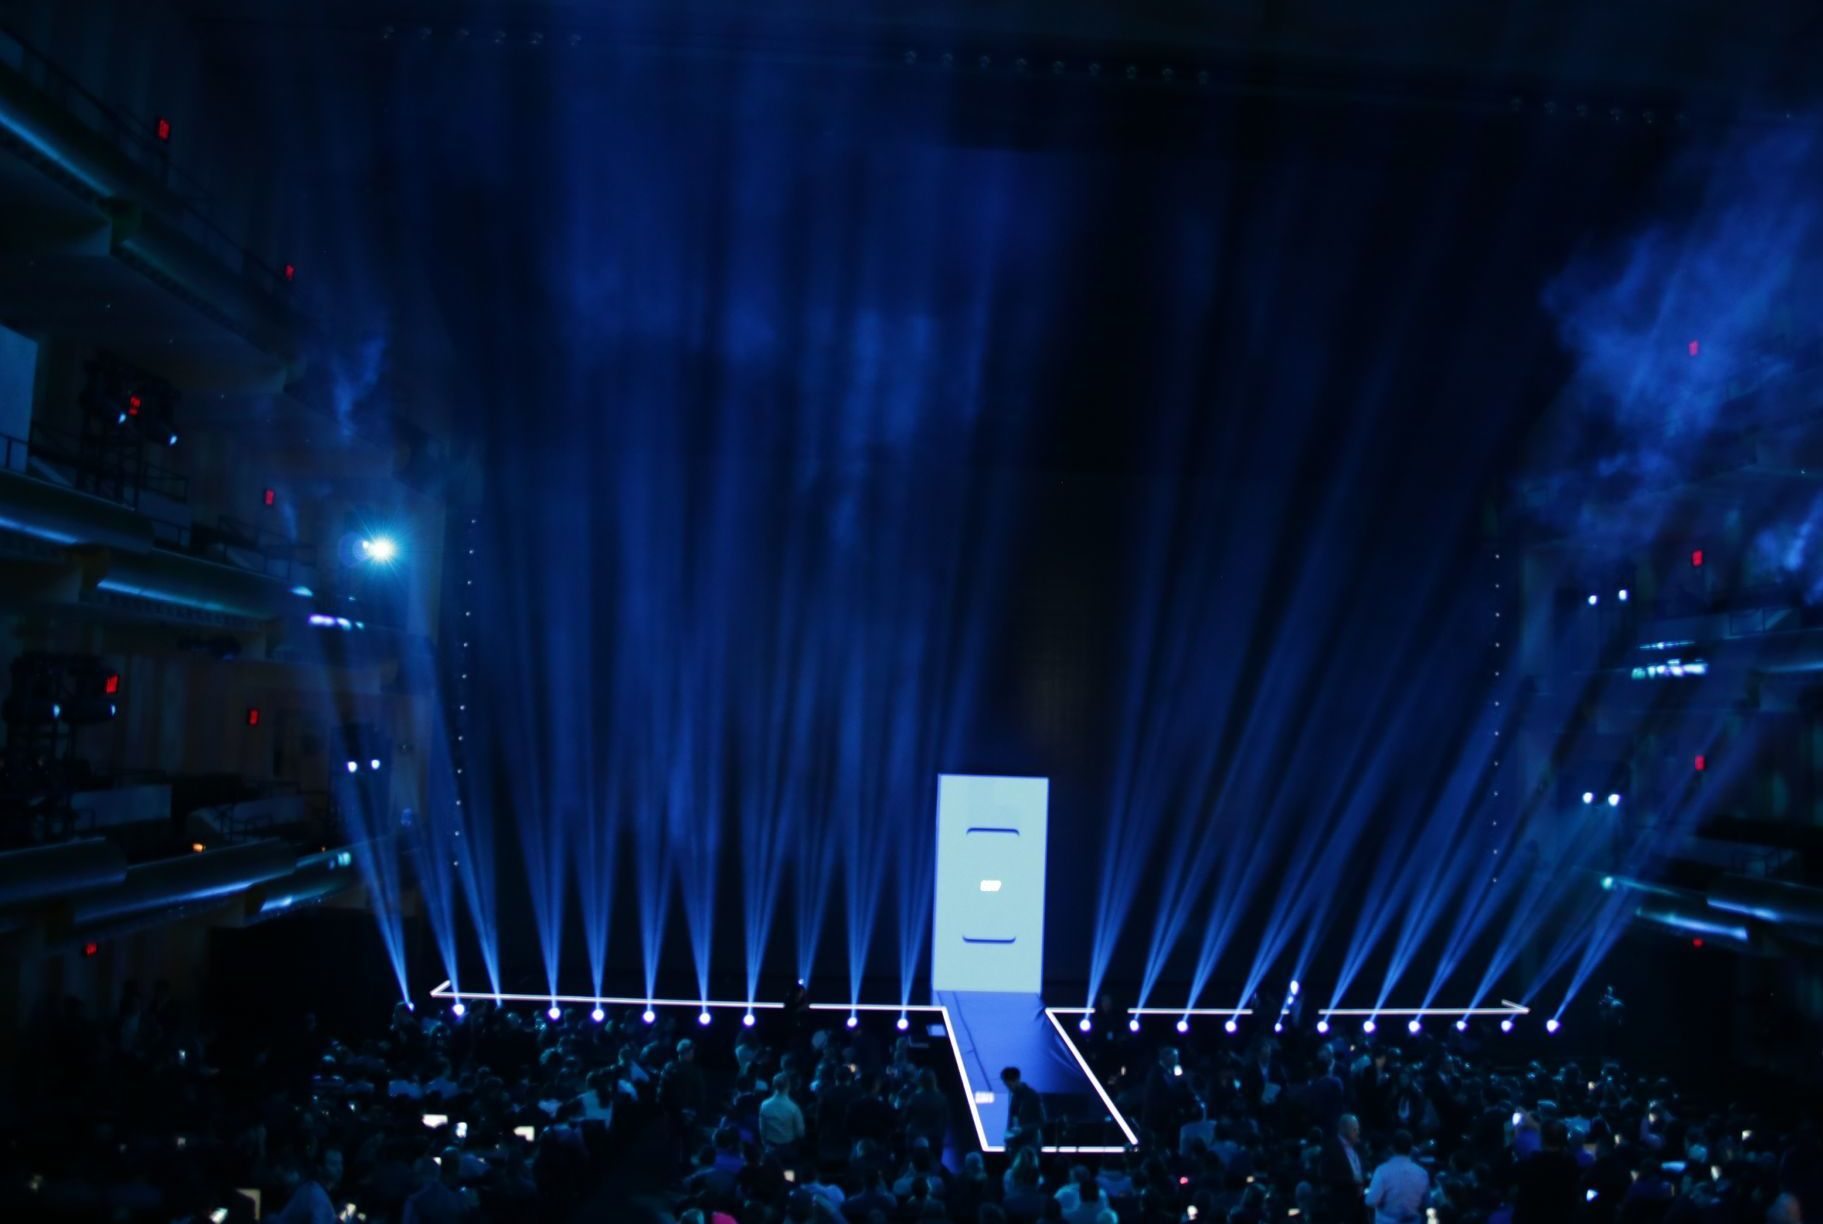 Samsung представила новые флагманы - Galaxy S8 и Galaxy S8+